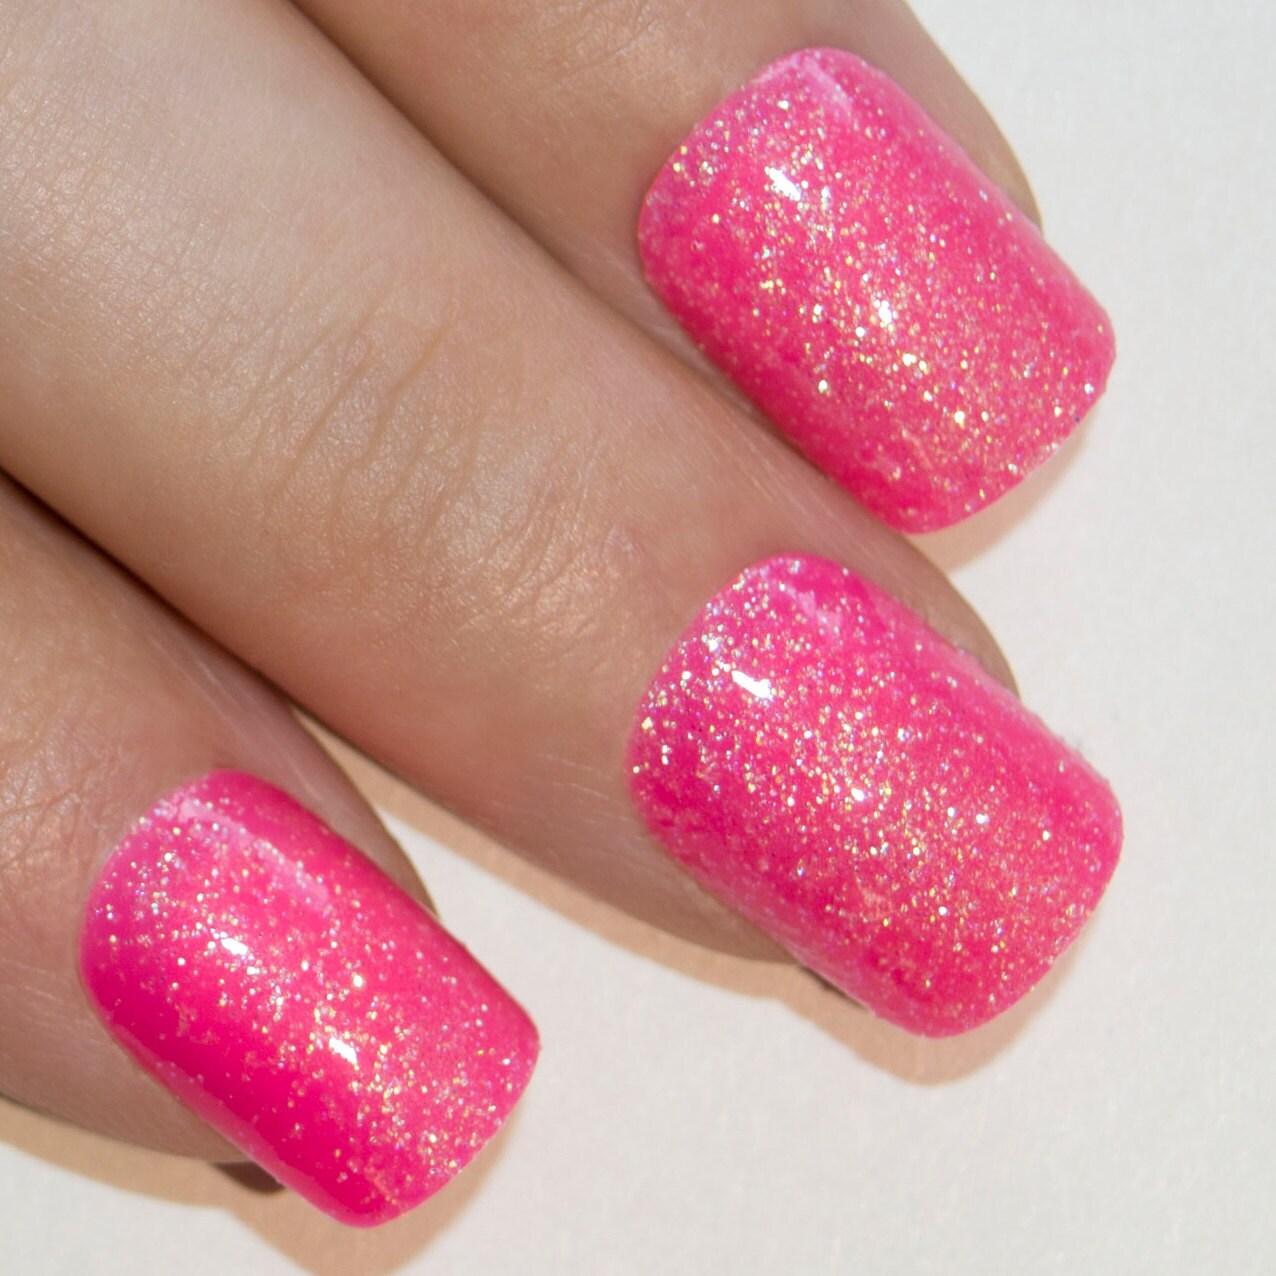 Bling Art False Nails French Manicure Pink Fuschia Gel Glitter ...